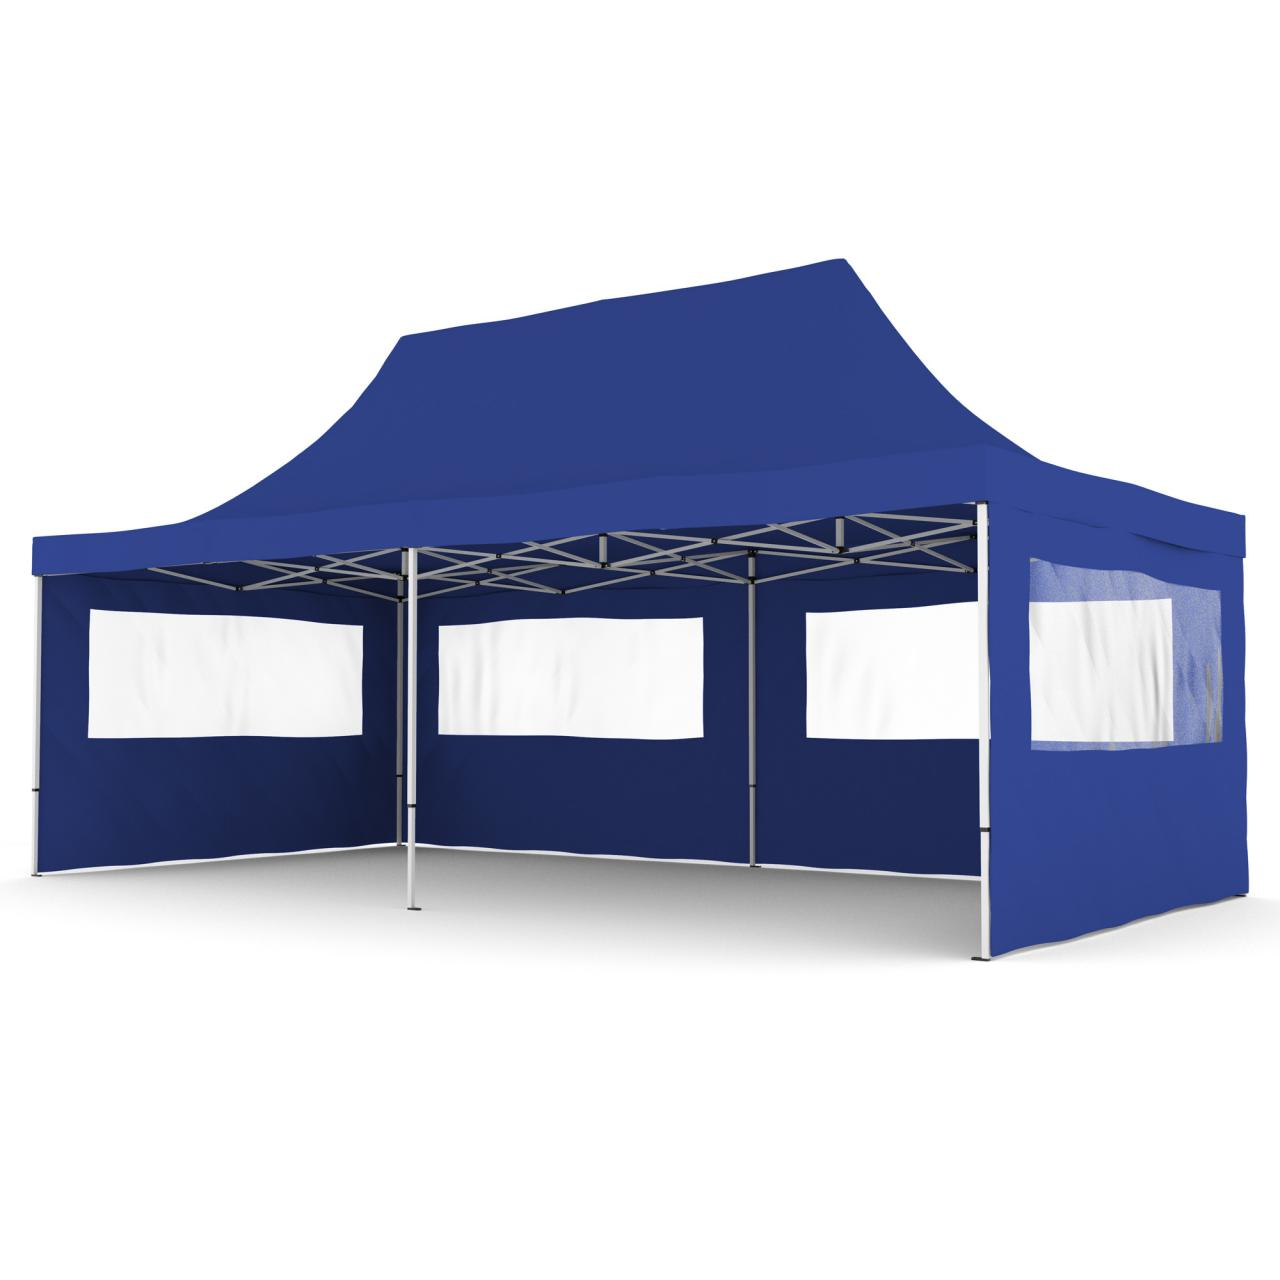 3x6 gartenpavillon alu faltzelt faltpavillon klappzelt gartenzelt partyzelt zelt ebay. Black Bedroom Furniture Sets. Home Design Ideas